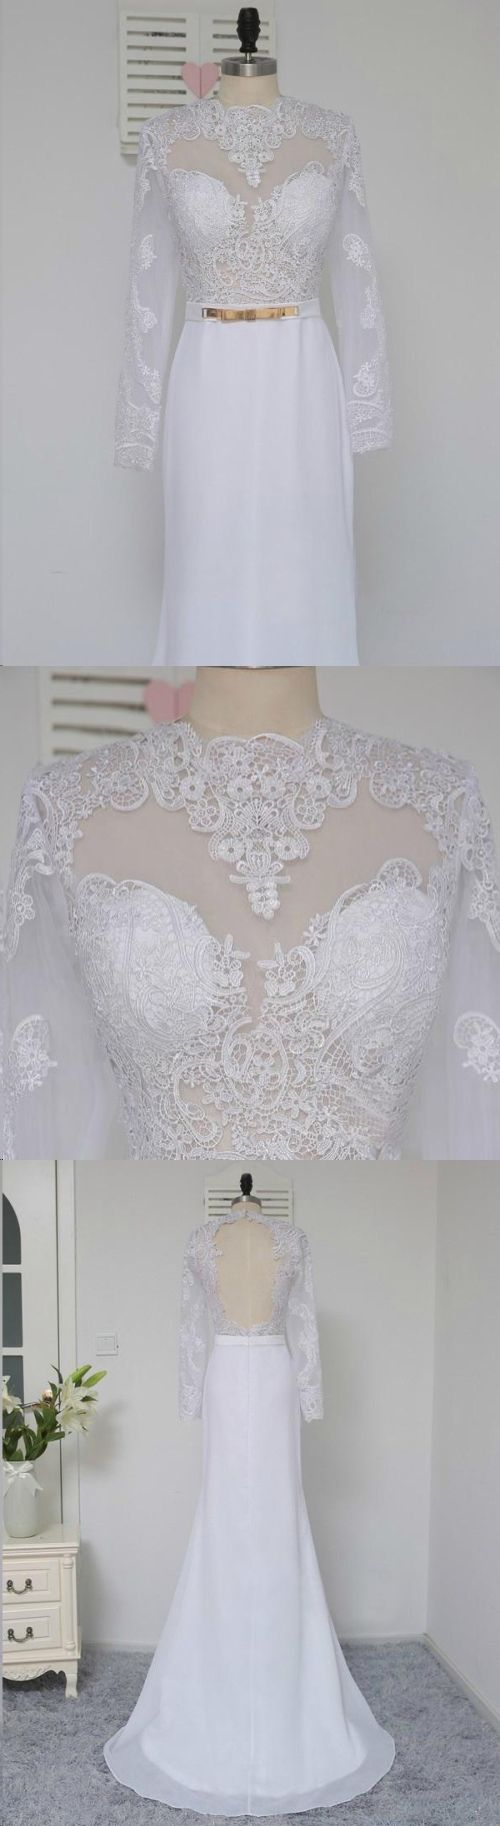 White prom dresses scoop short train appliques chiffon sexy prom